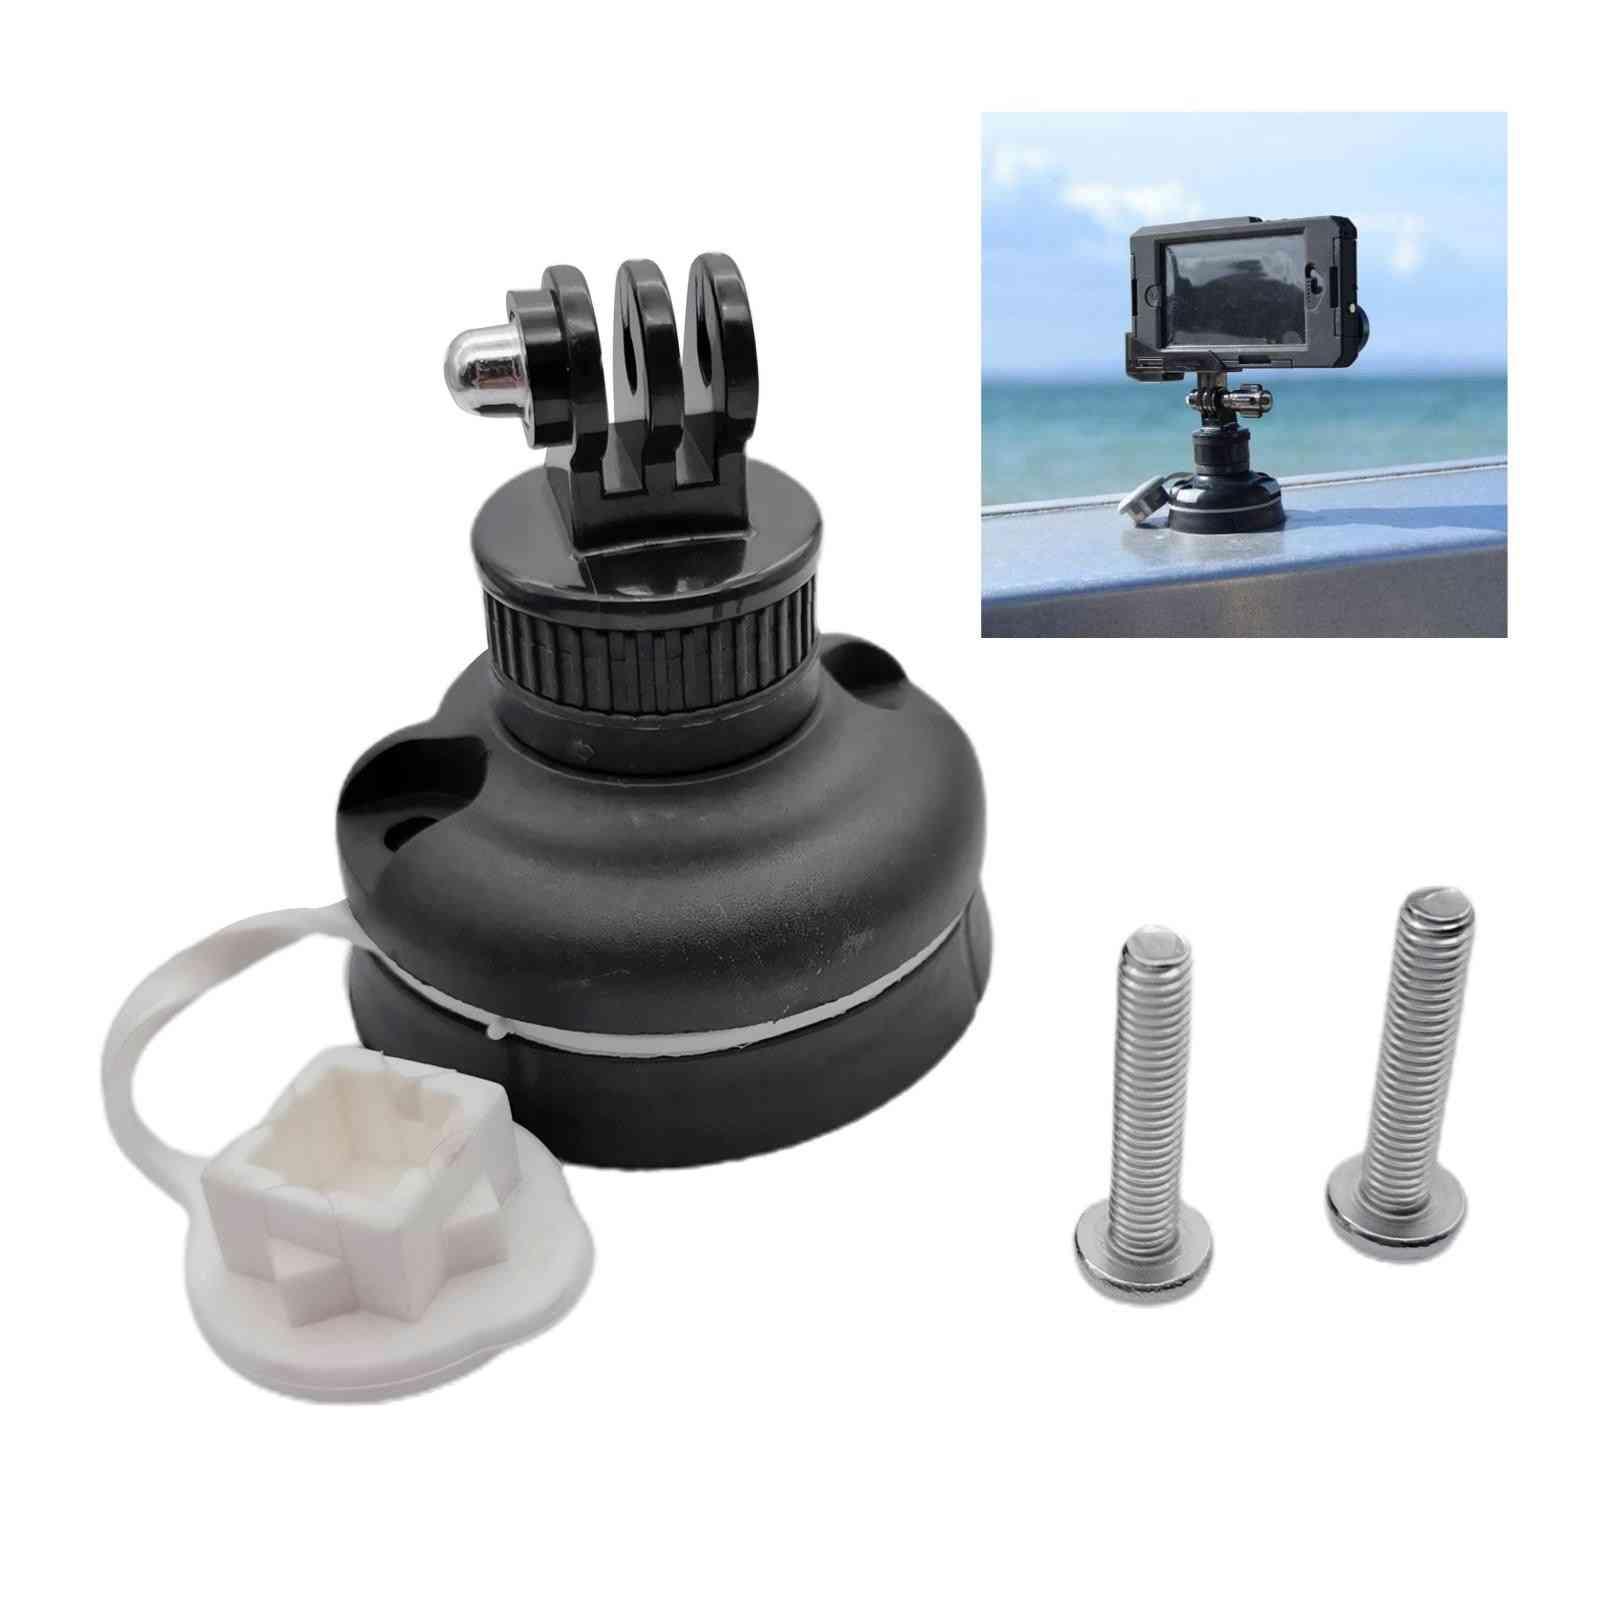 Safety Sports Camera Mount Base Support